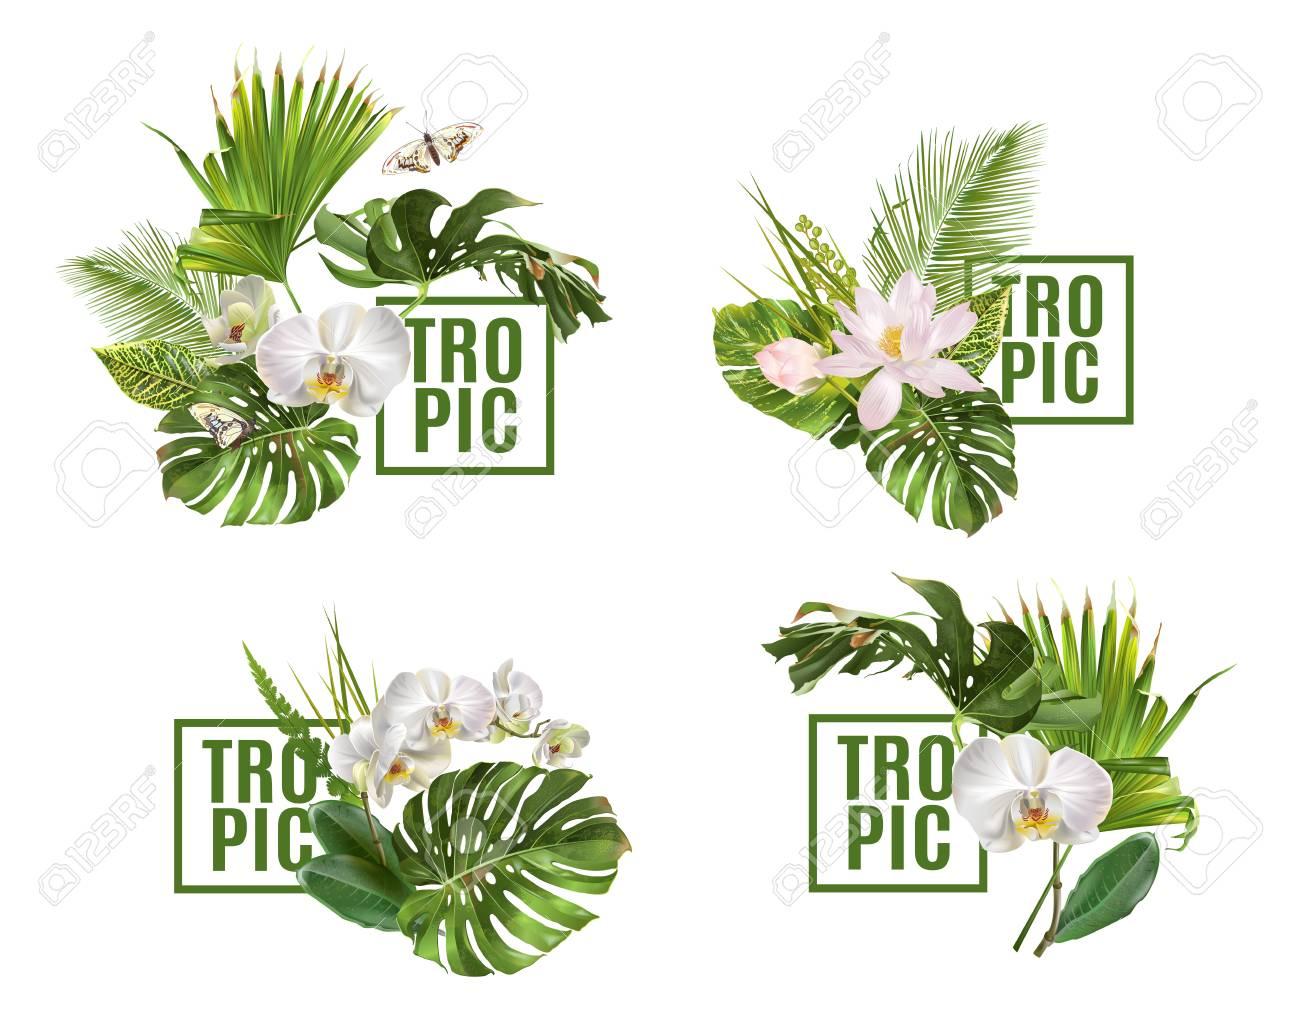 Tropic plants banner set - 90882057